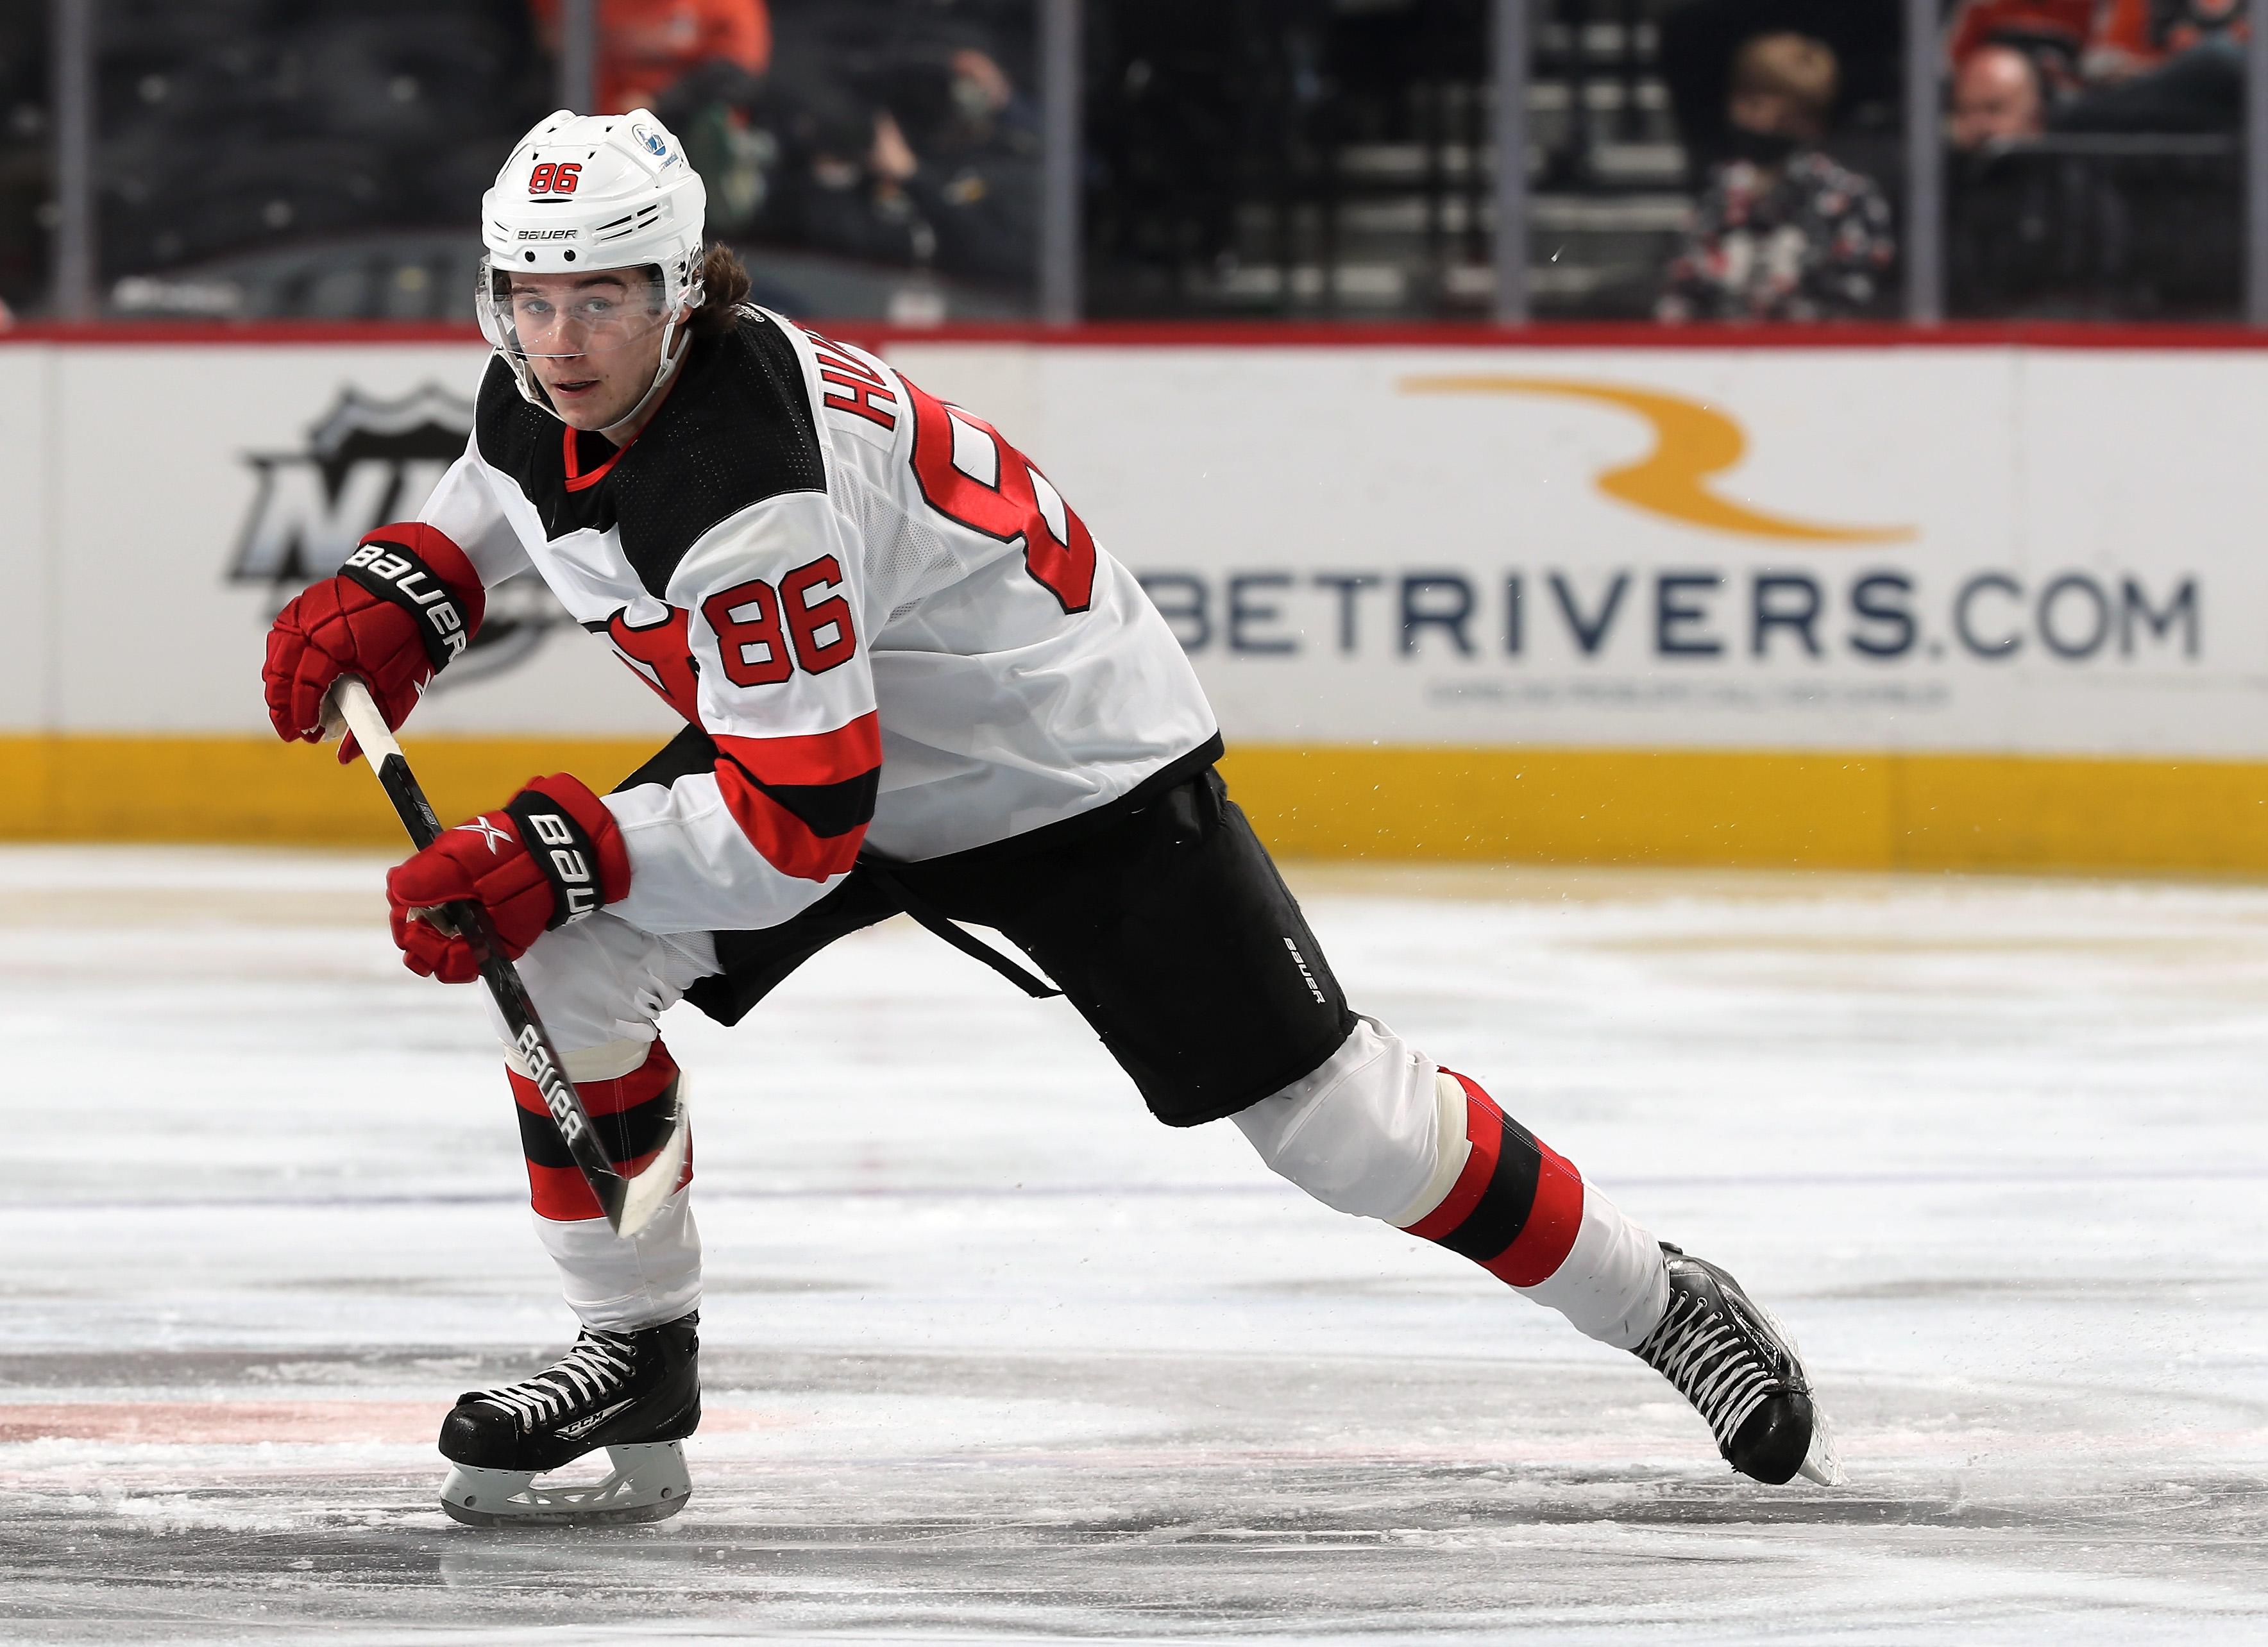 Jack Hughes #86 of the New Jersey Devils skates against the Philadelphia Flyers at the Wells Fargo Center on May 1, 2021 in Philadelphia, Pennsylvania.